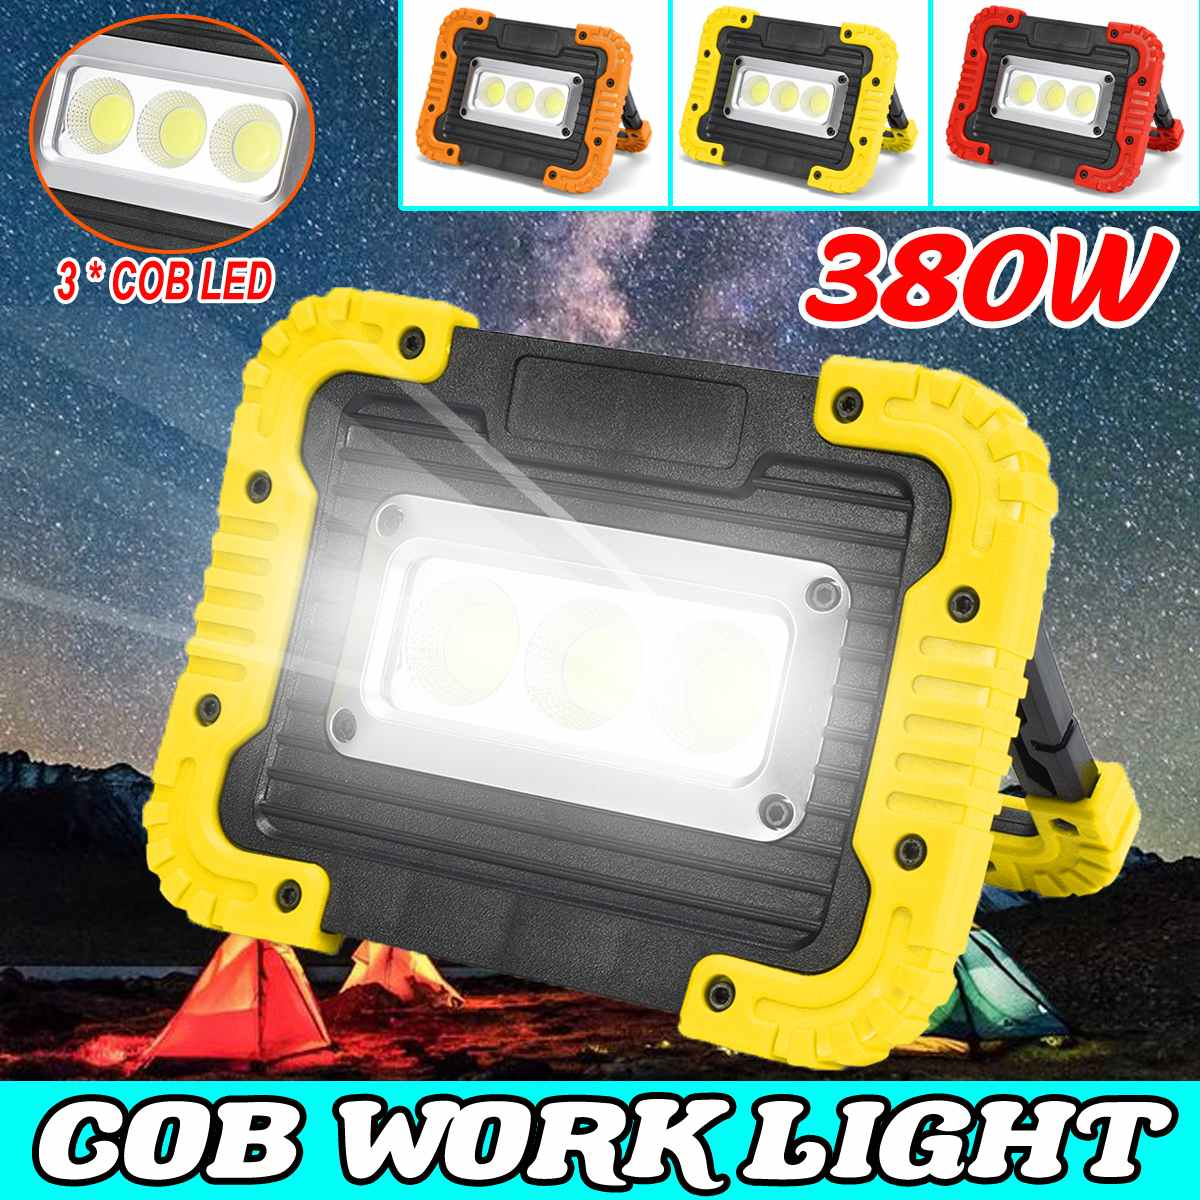 Usb / Battery 380W COB Work Lamp LED Portable Lantern Camping Light Led Portable Spotlight Emergency Light Led Searchlight